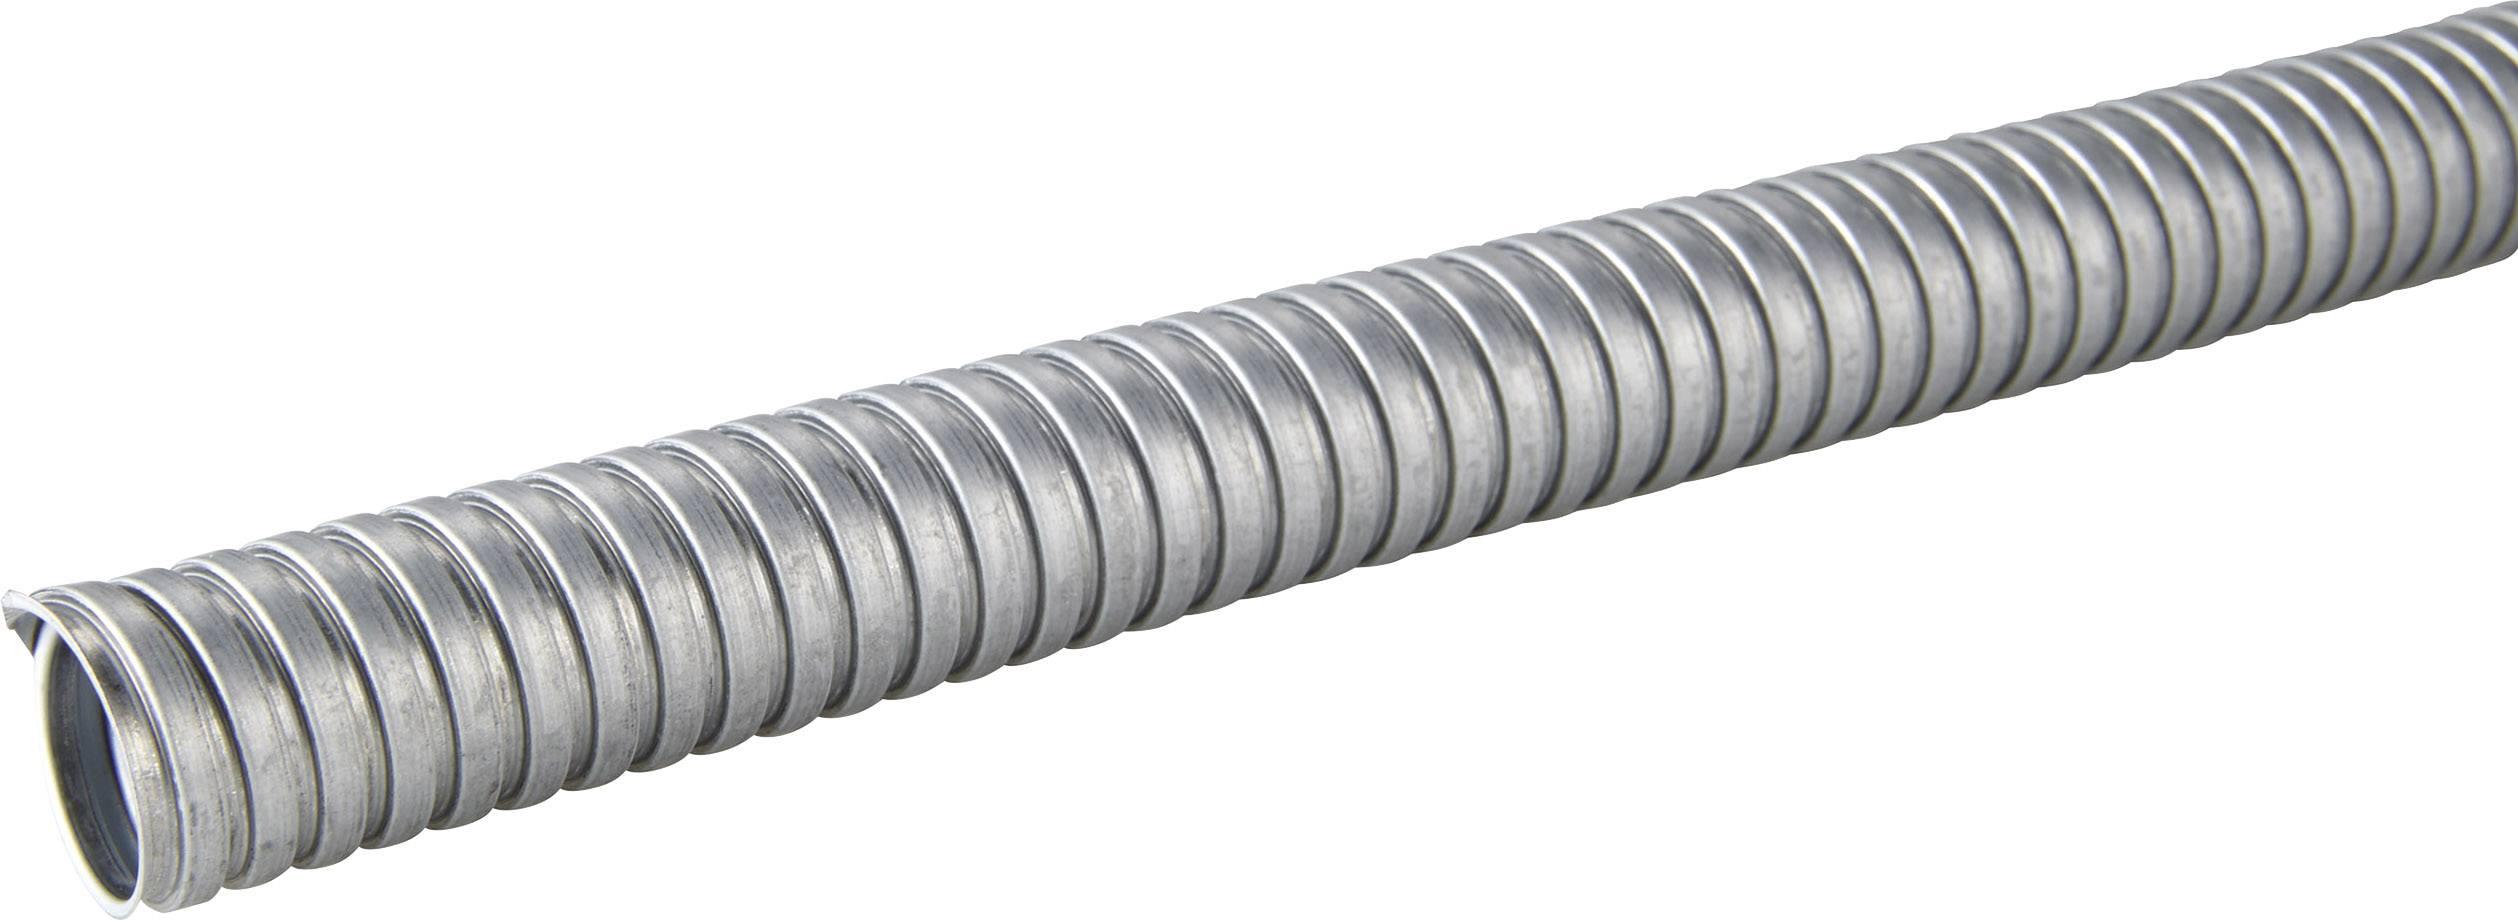 Ochranná hadice na kov LAPP SILVYN® AS 11/14x17 61802100, stříbrná, 50 m